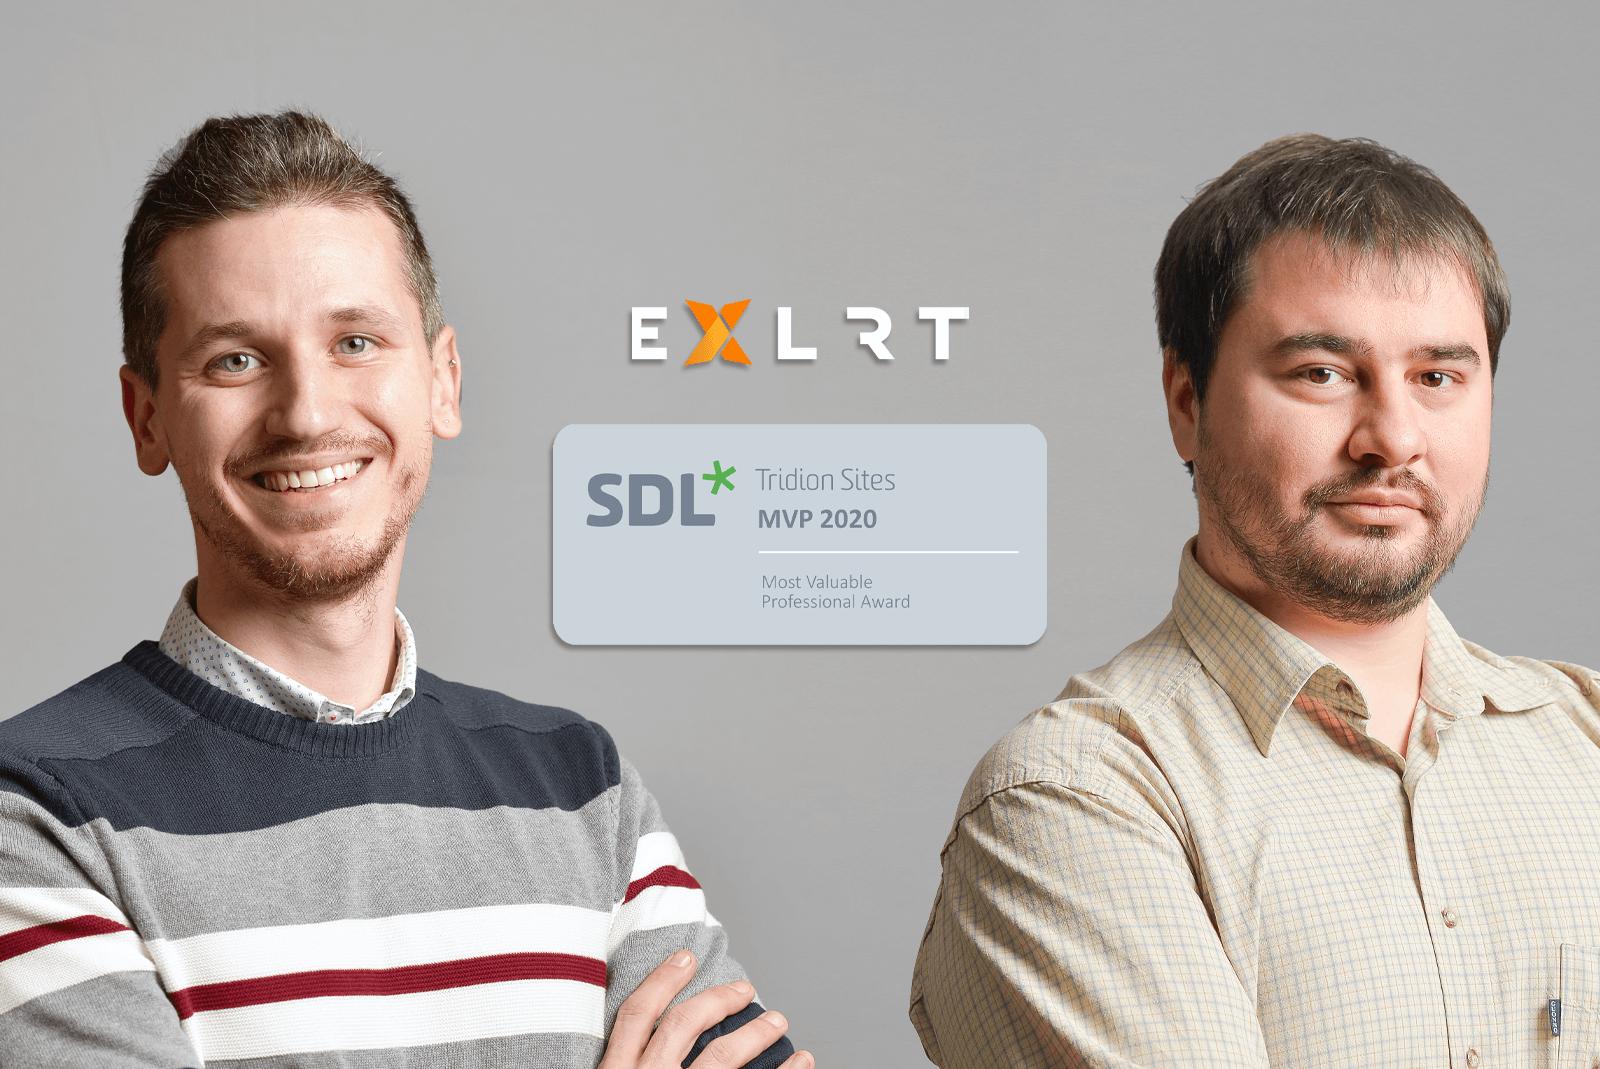 Two EXLRT Employees win SDL Tridion Sites MVP 2020 award